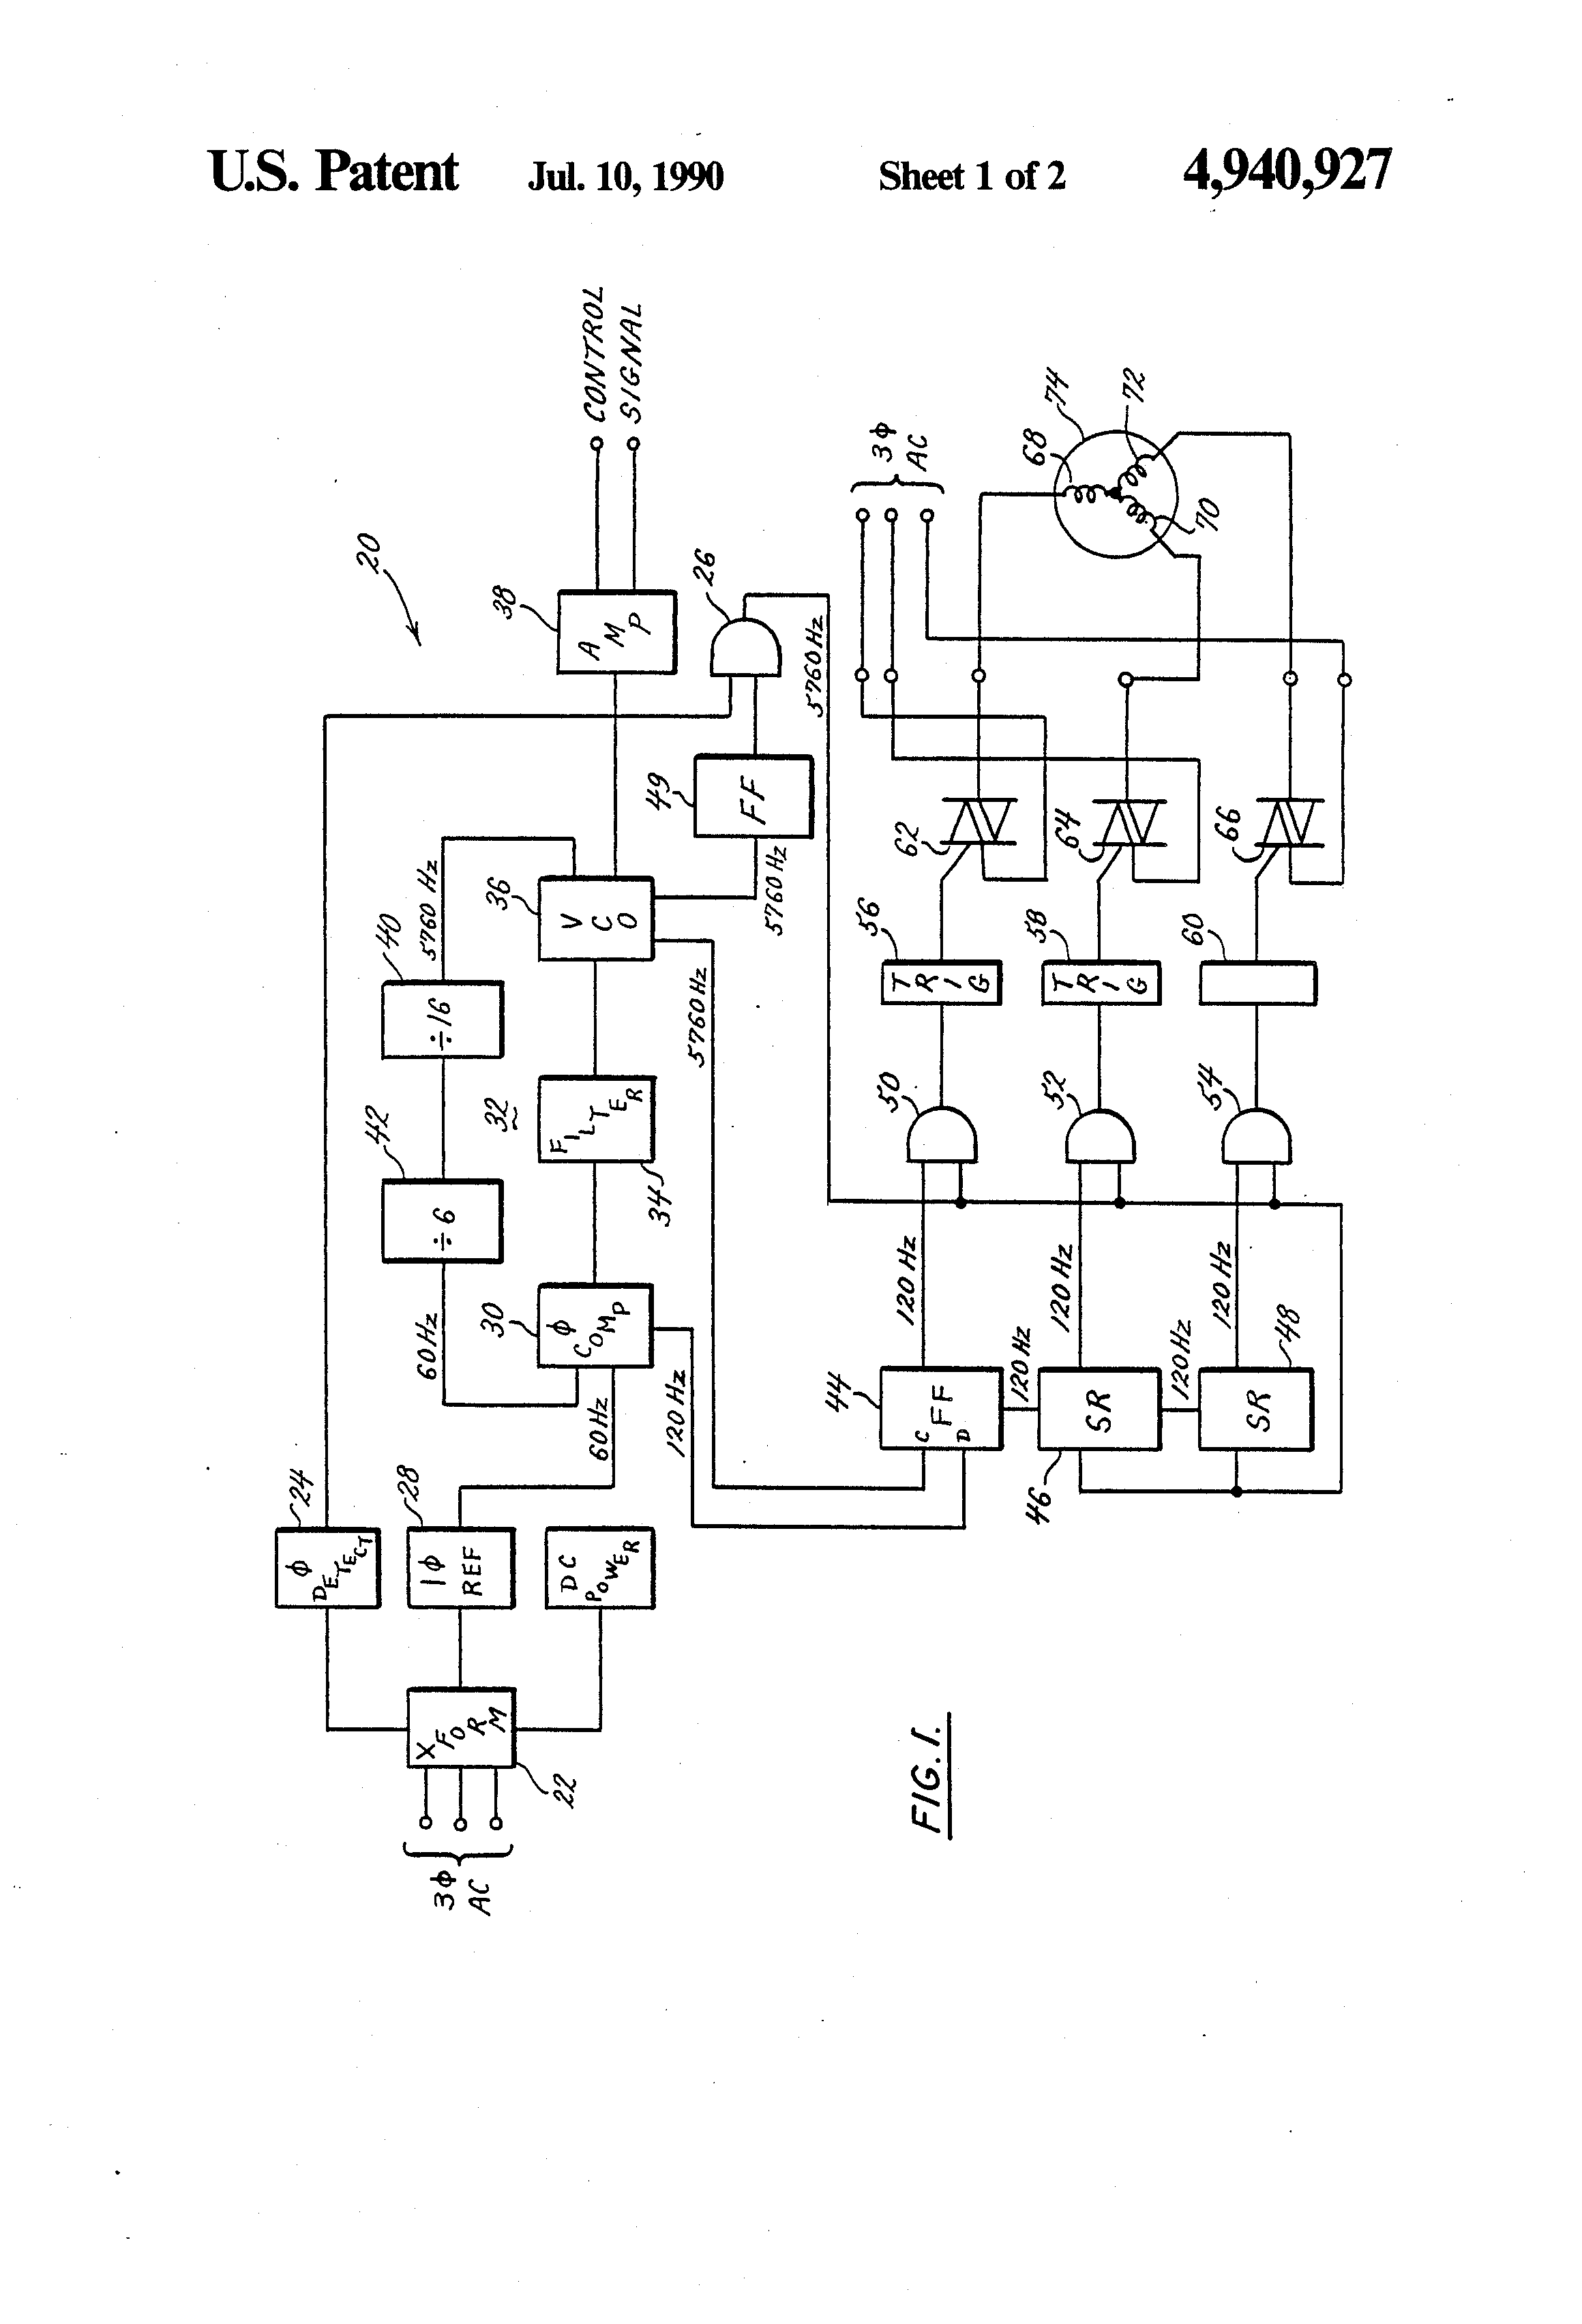 magnetek 6300 wiring diagram magnetek capacitors wiring